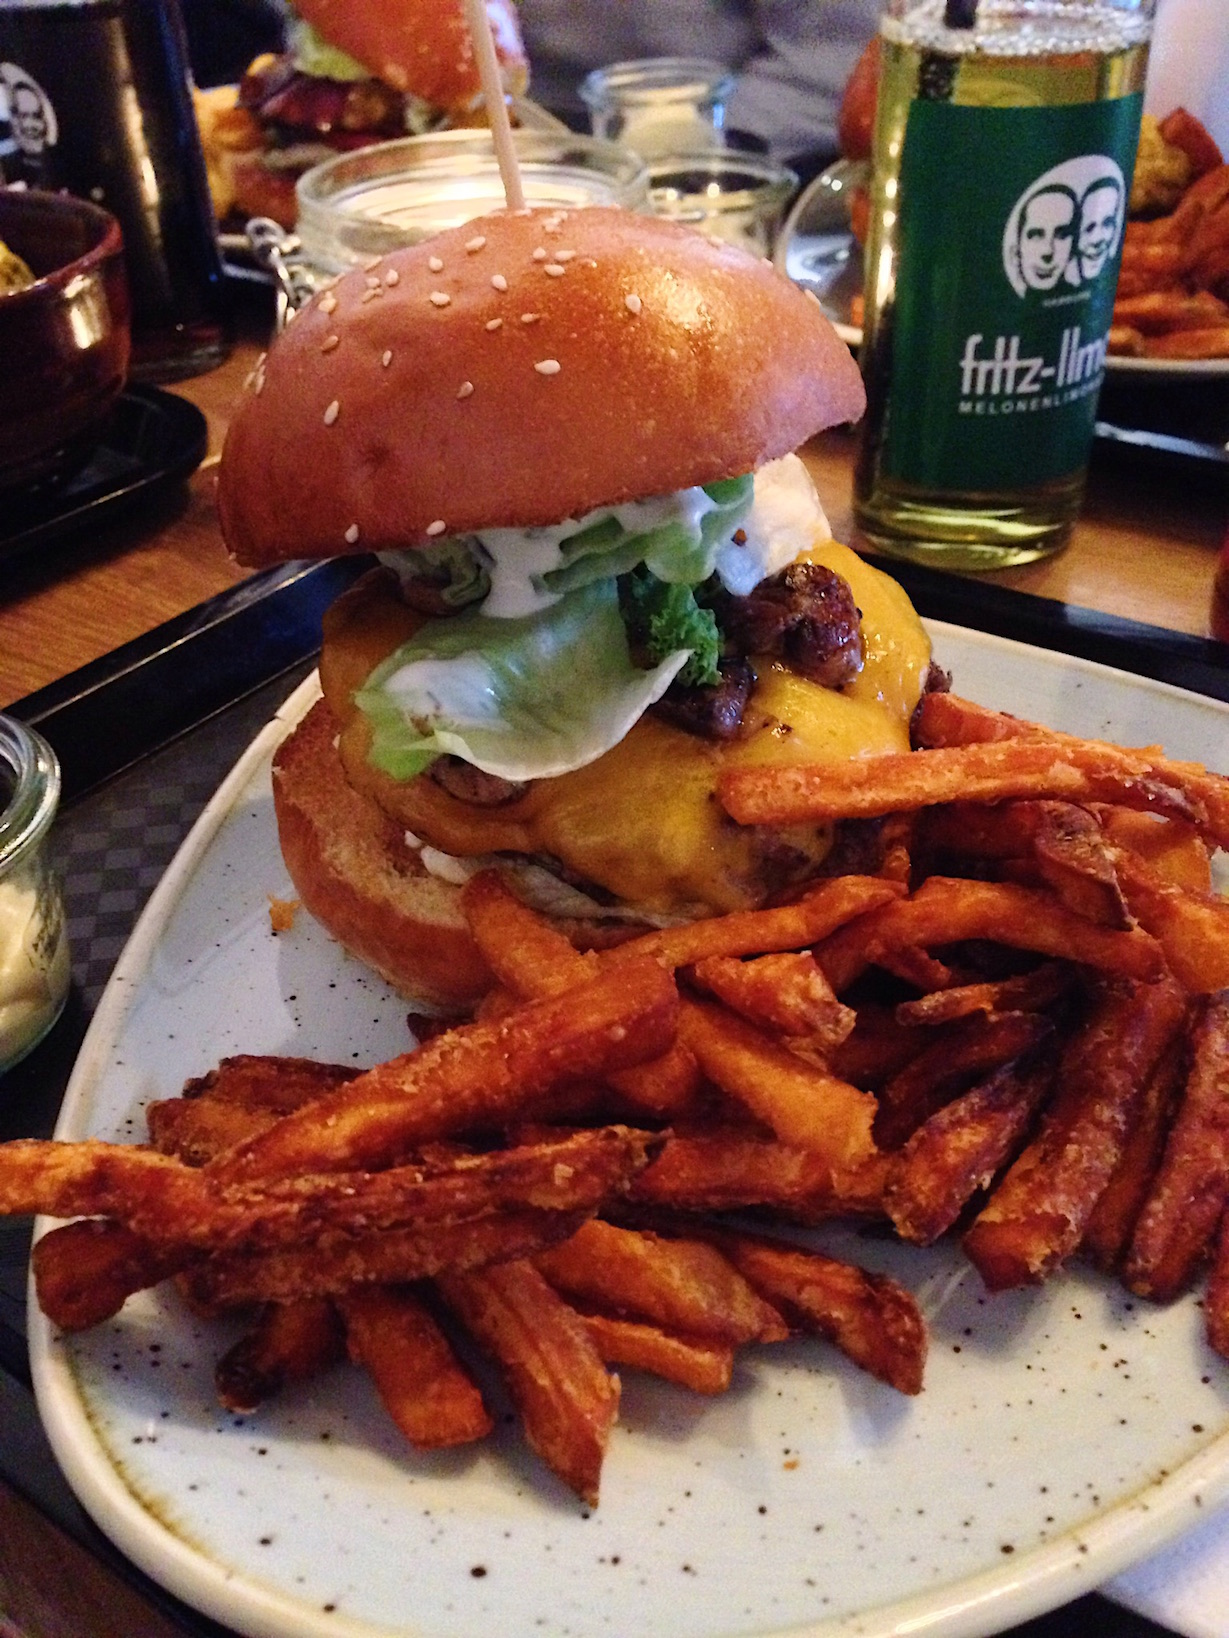 lindenblatt burger bar hannover review mimi rose